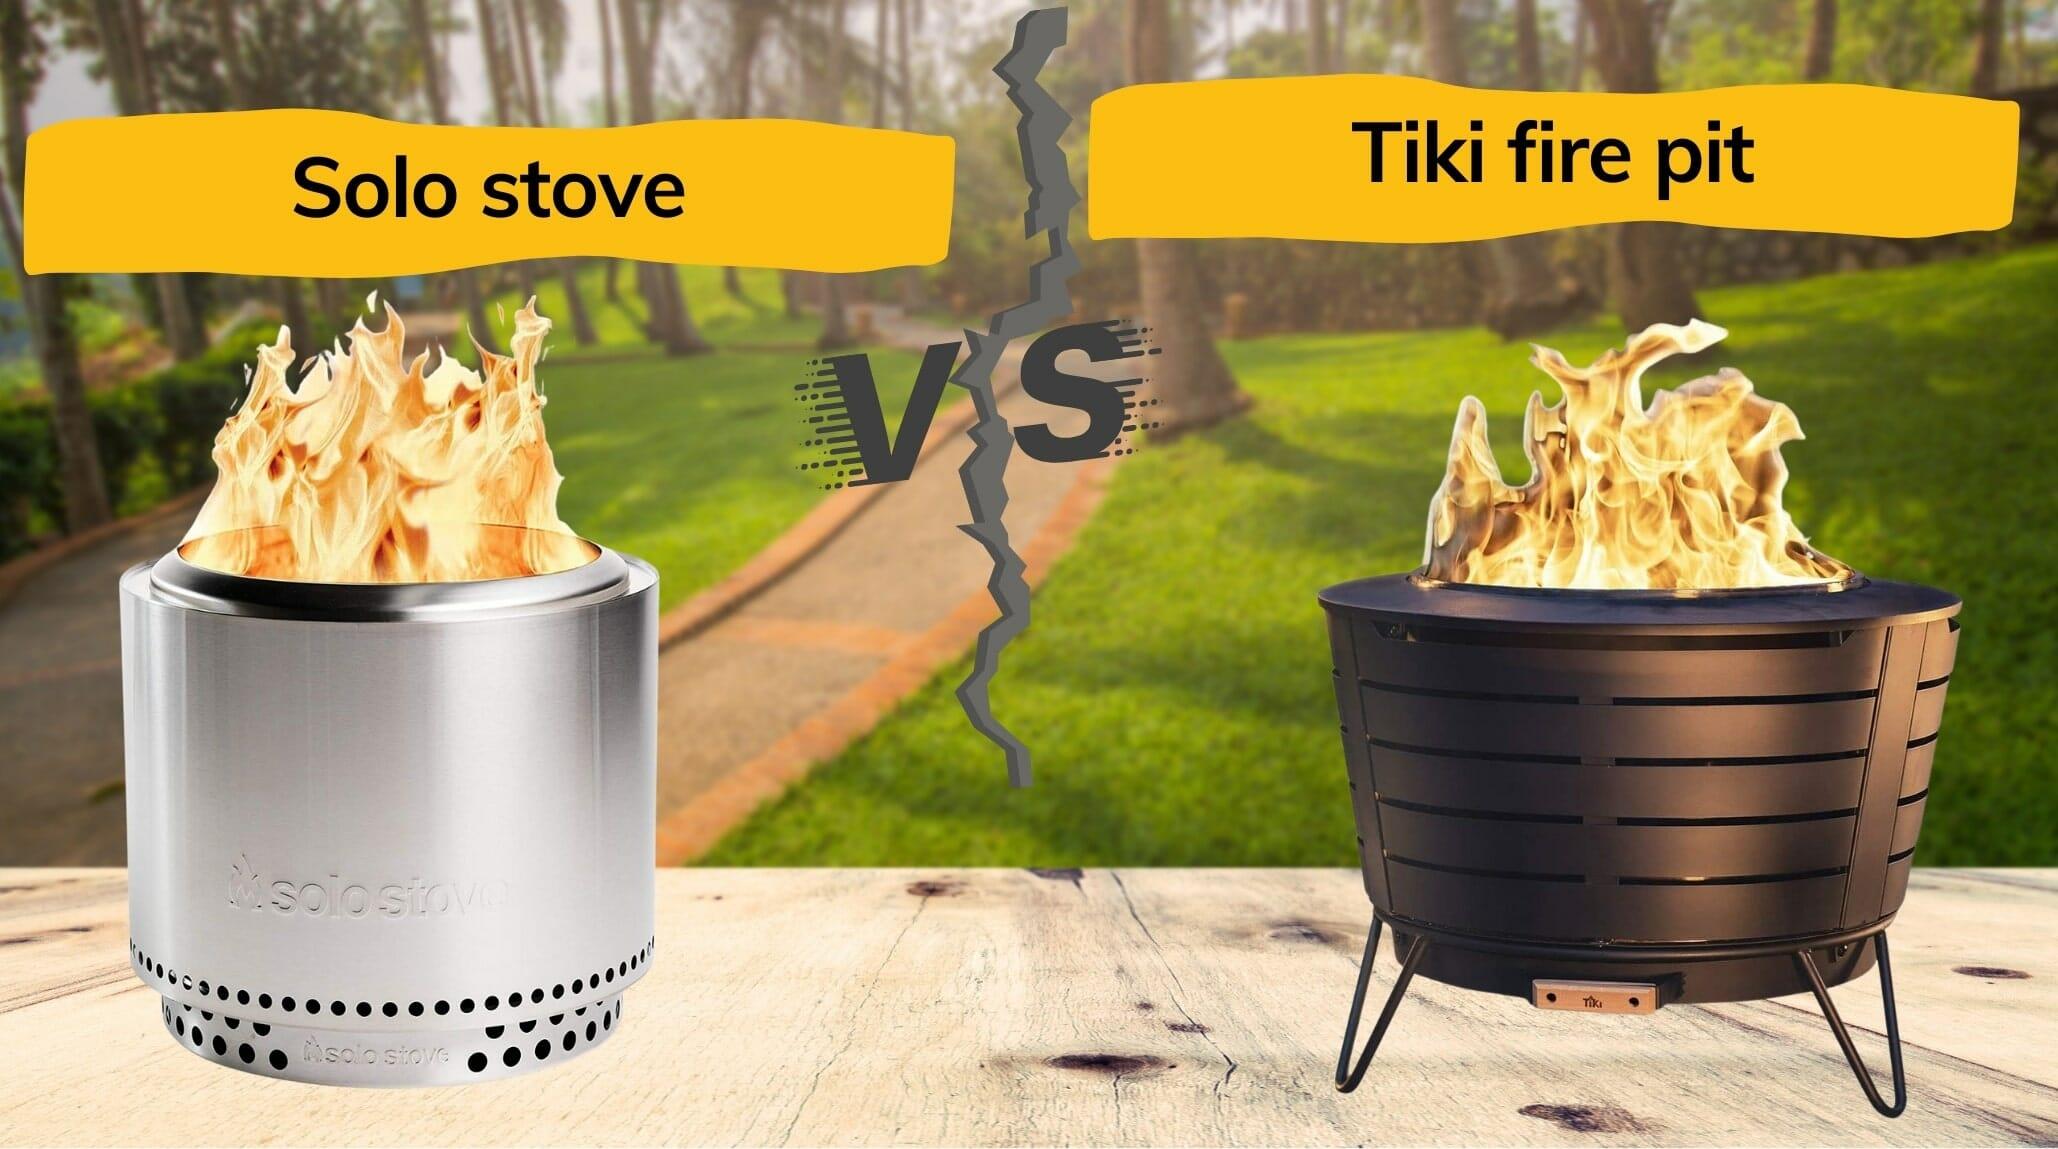 solo stove vs tiki fire pit